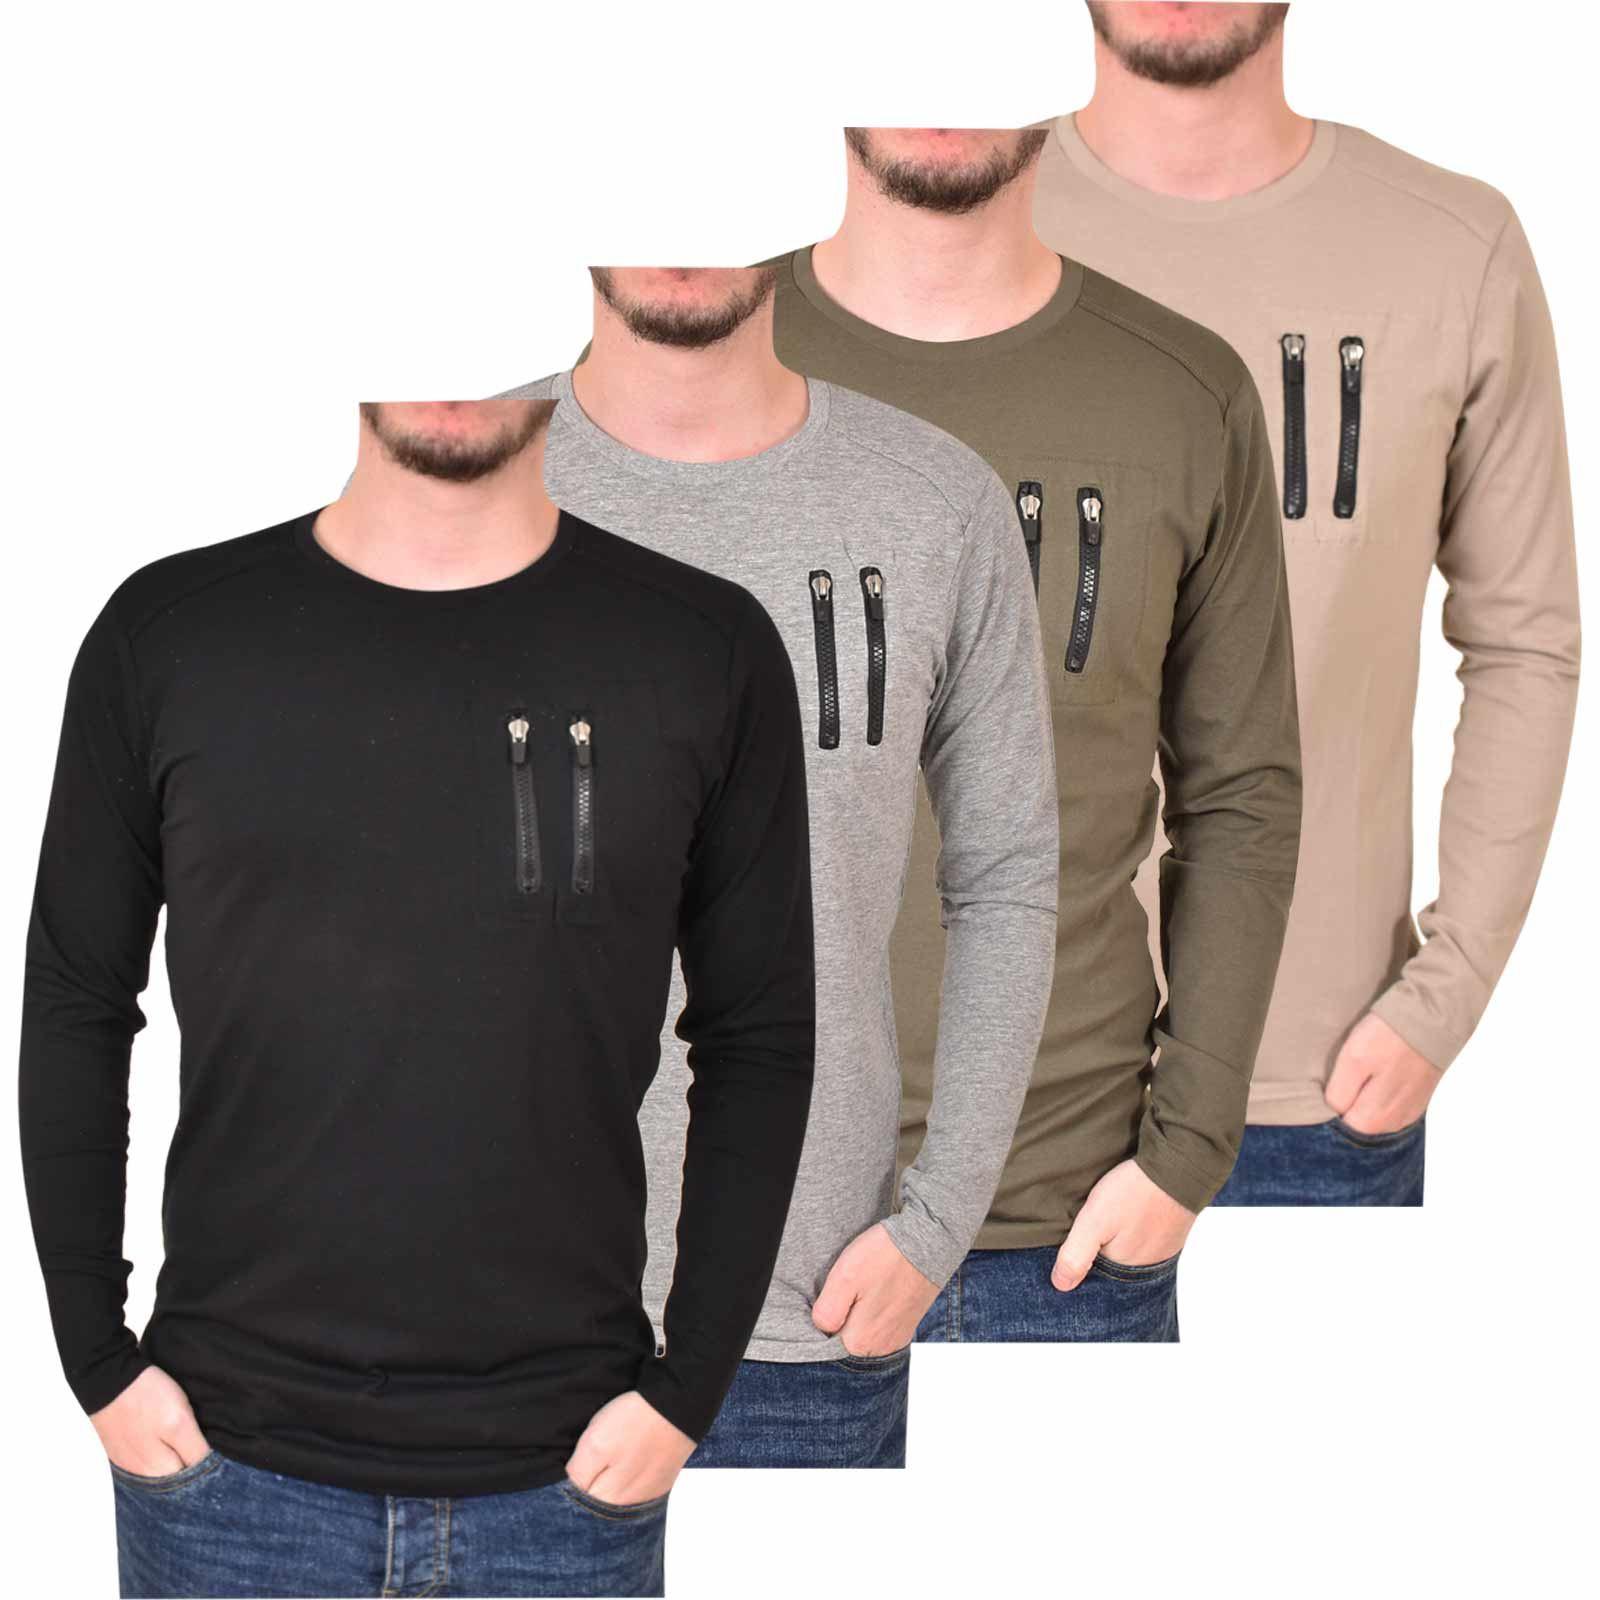 cff373f44436 Details about Mens Long Sleeve T-Shirt Crew Neck Zip Pocket Cotton Regular  Tee Loyalty   Faith